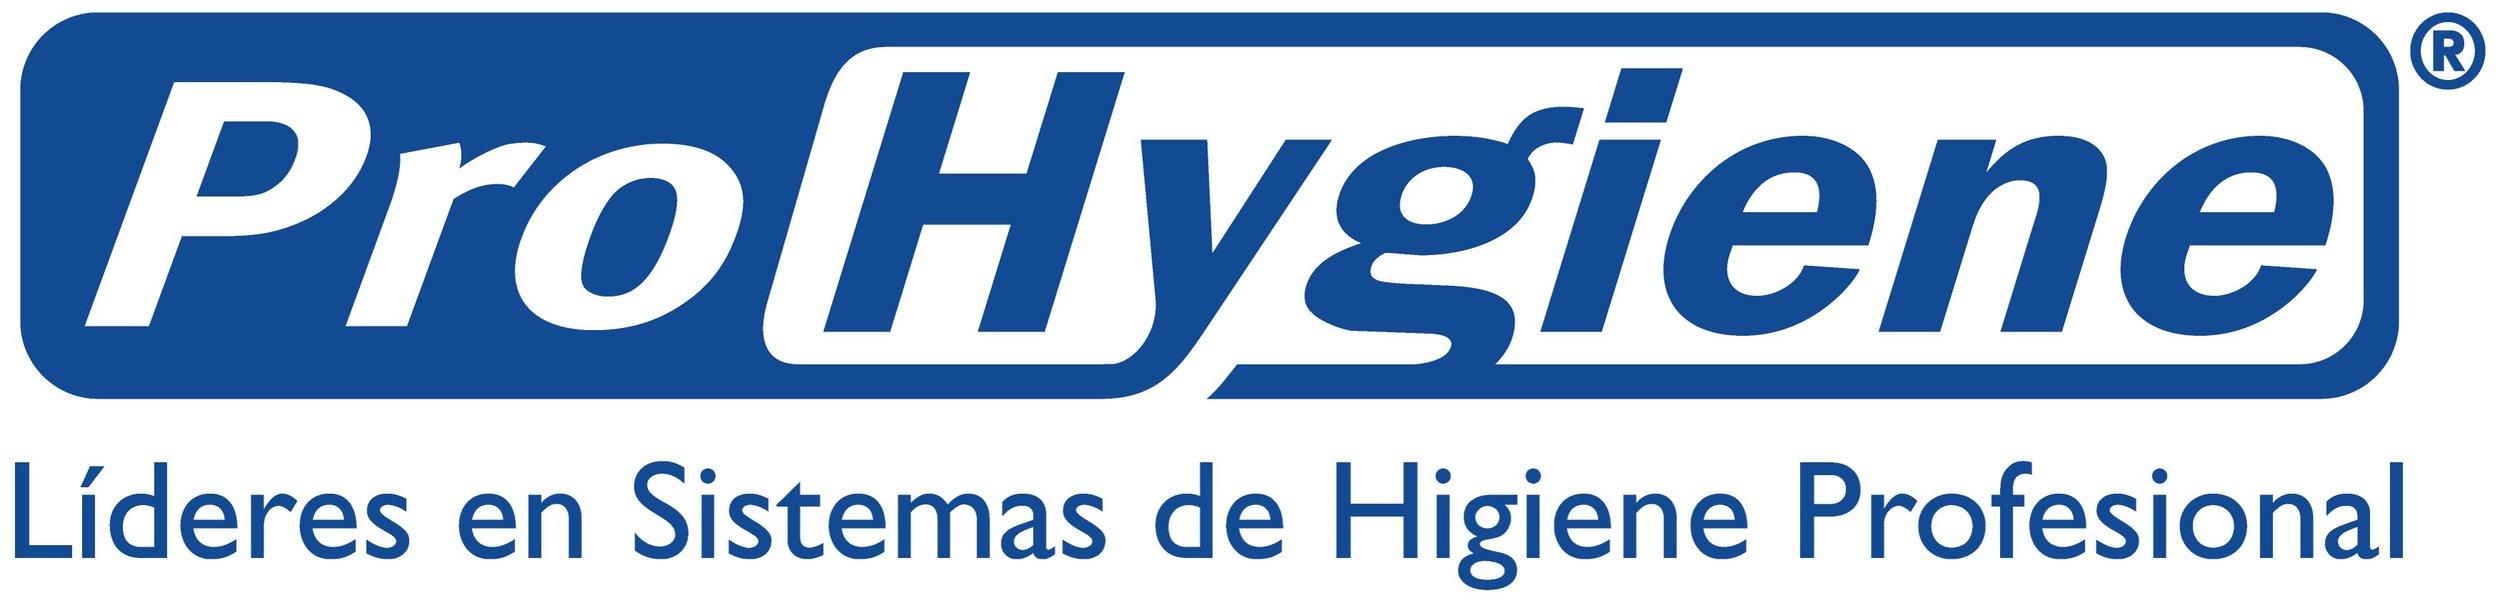 Logo Prohygiene